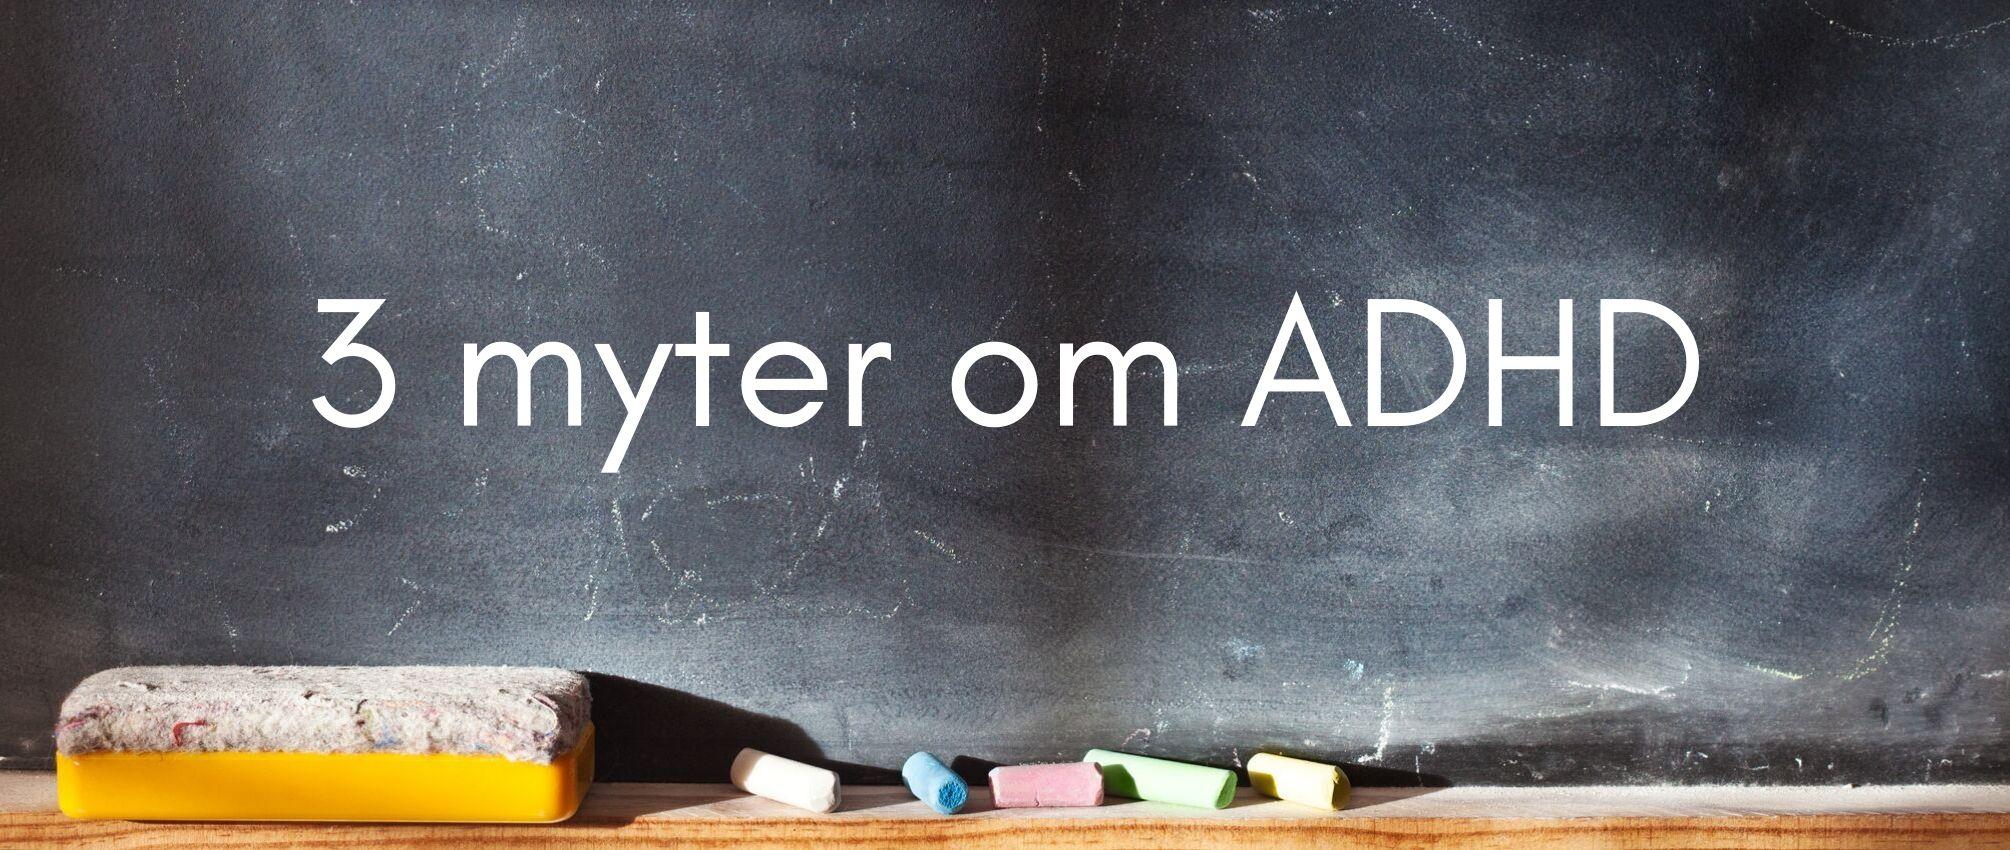 ADHD myter